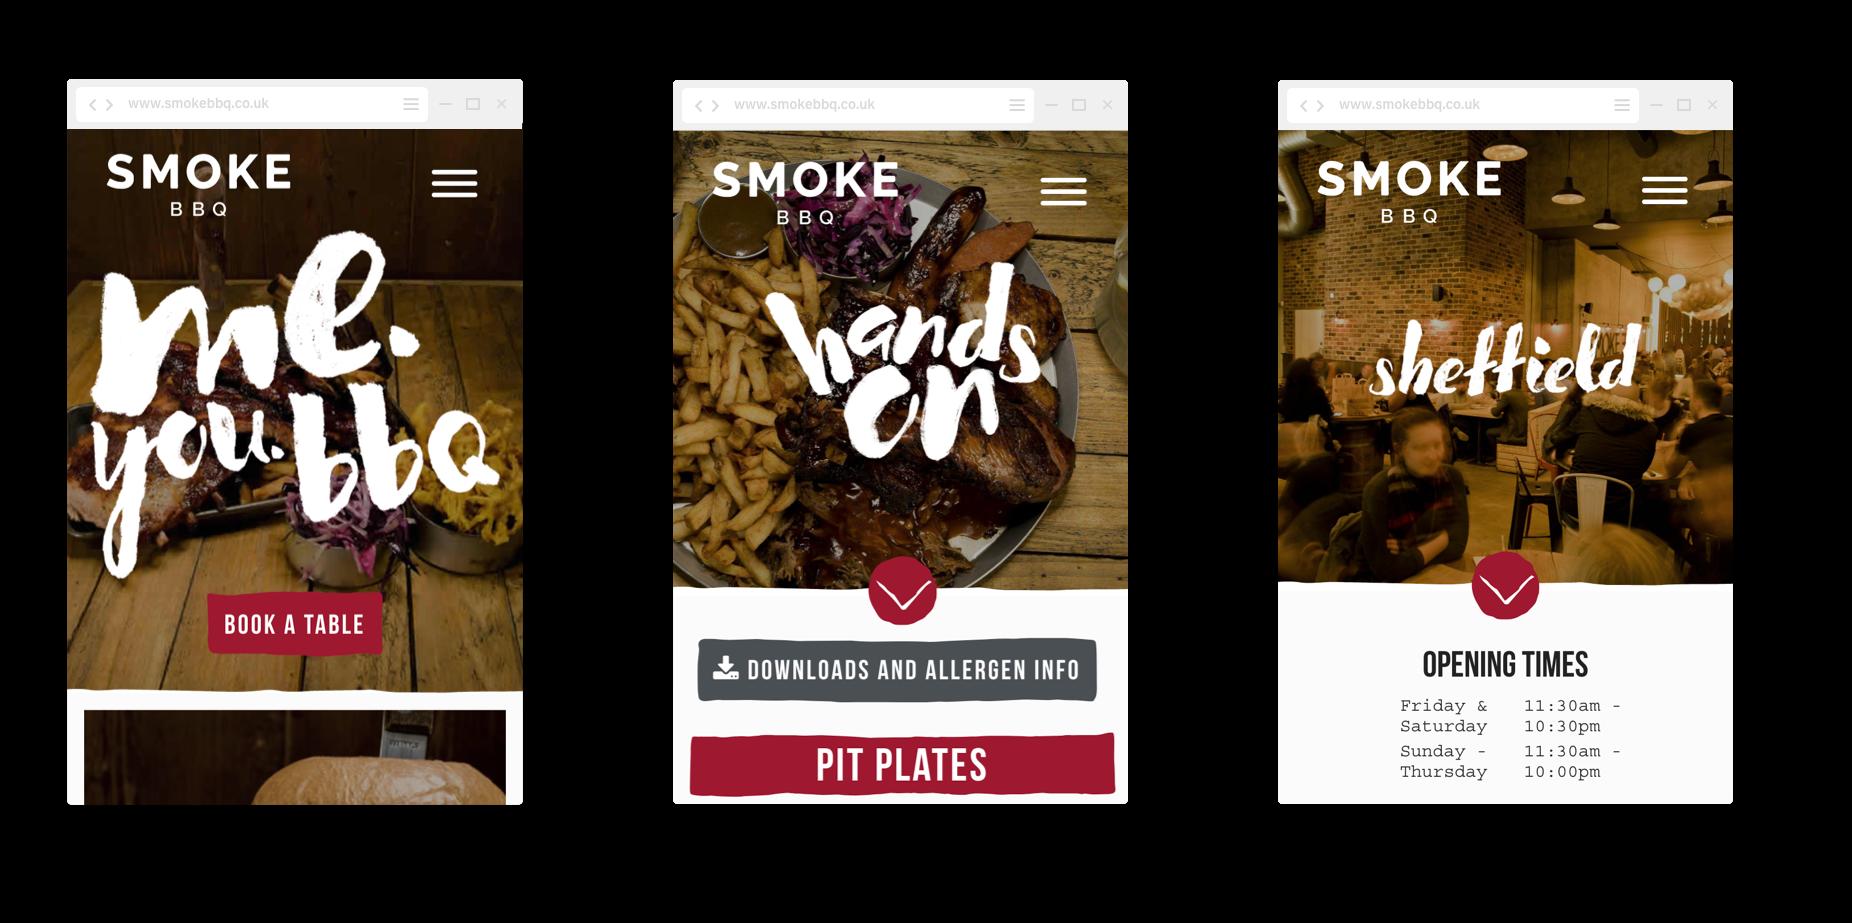 Smoke mobile designs